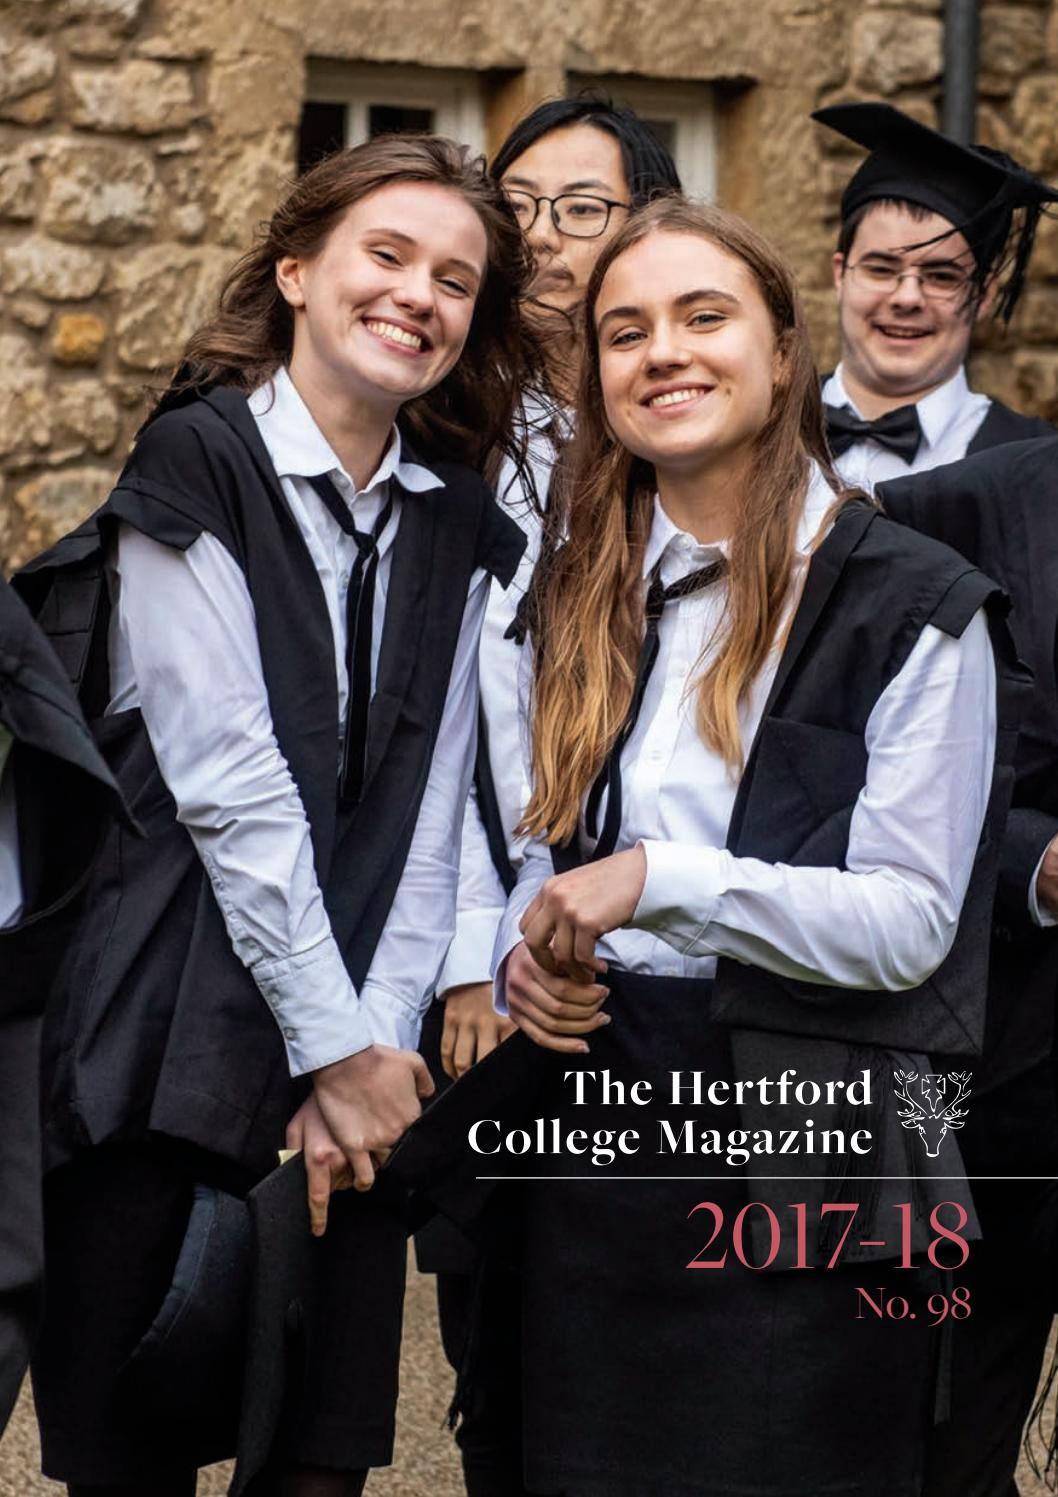 9fc89c7c72e Hertford College Magazine 2017-18 by Hertford College - issuu